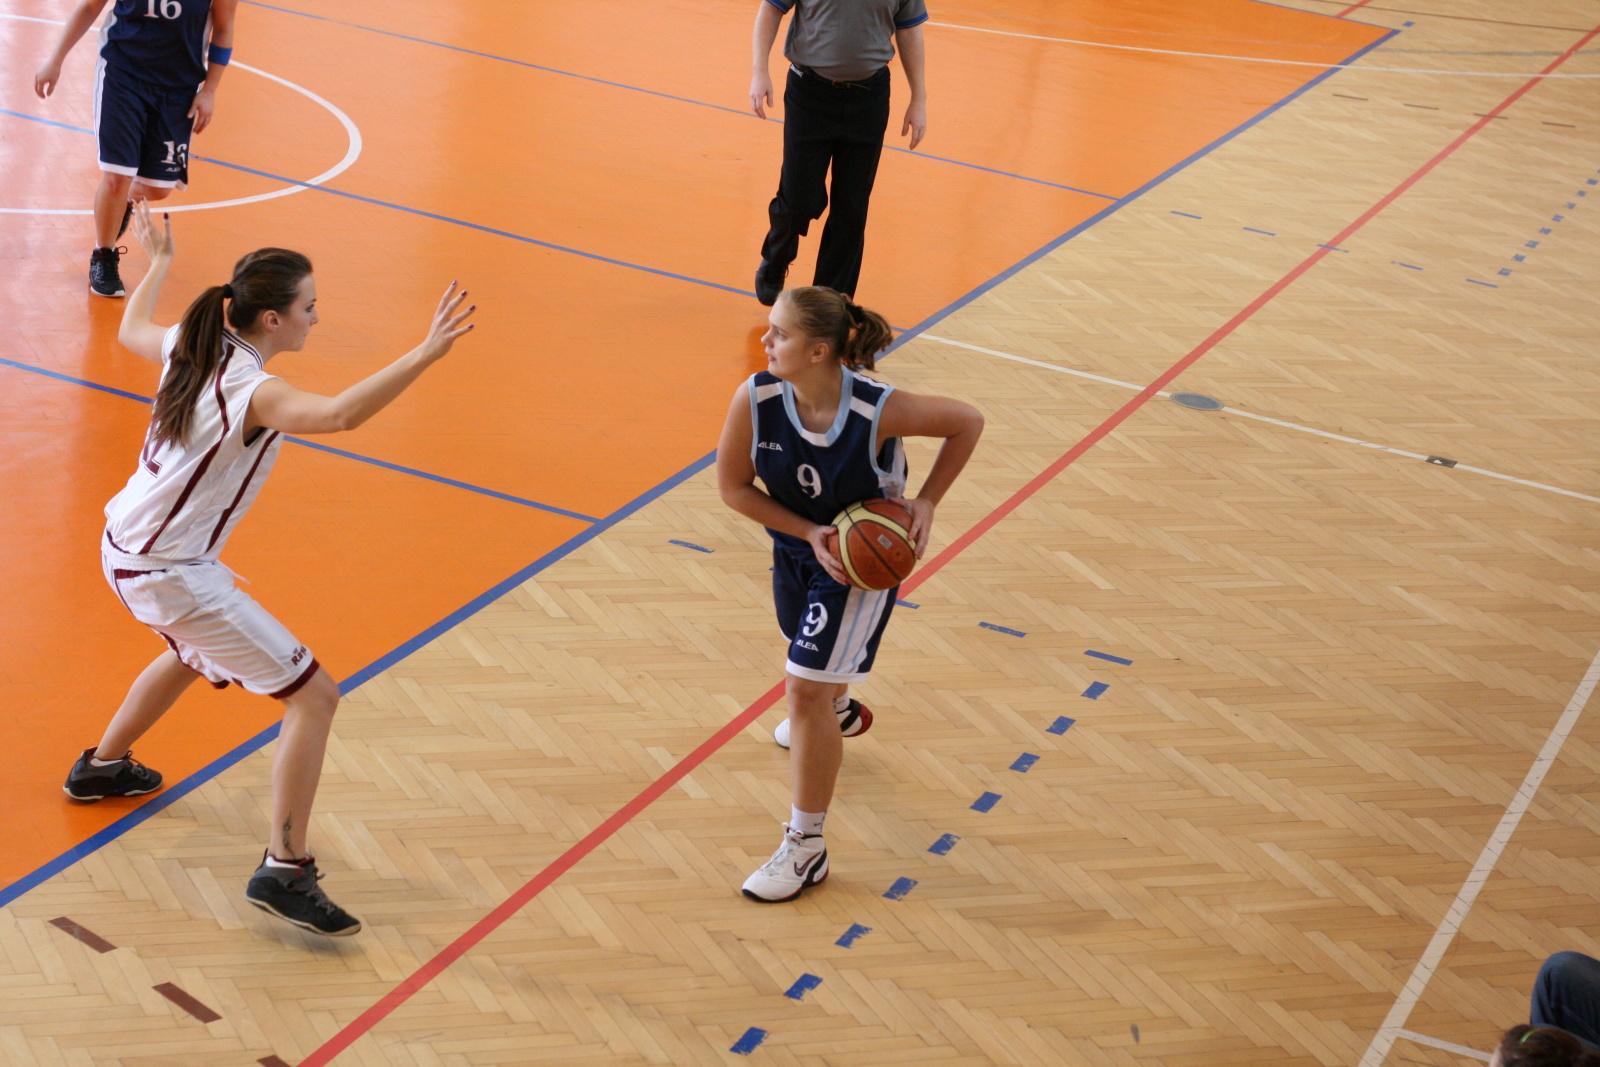 bk-zs-zvolen-bk-petrzalka-basketbal-juniorky-11